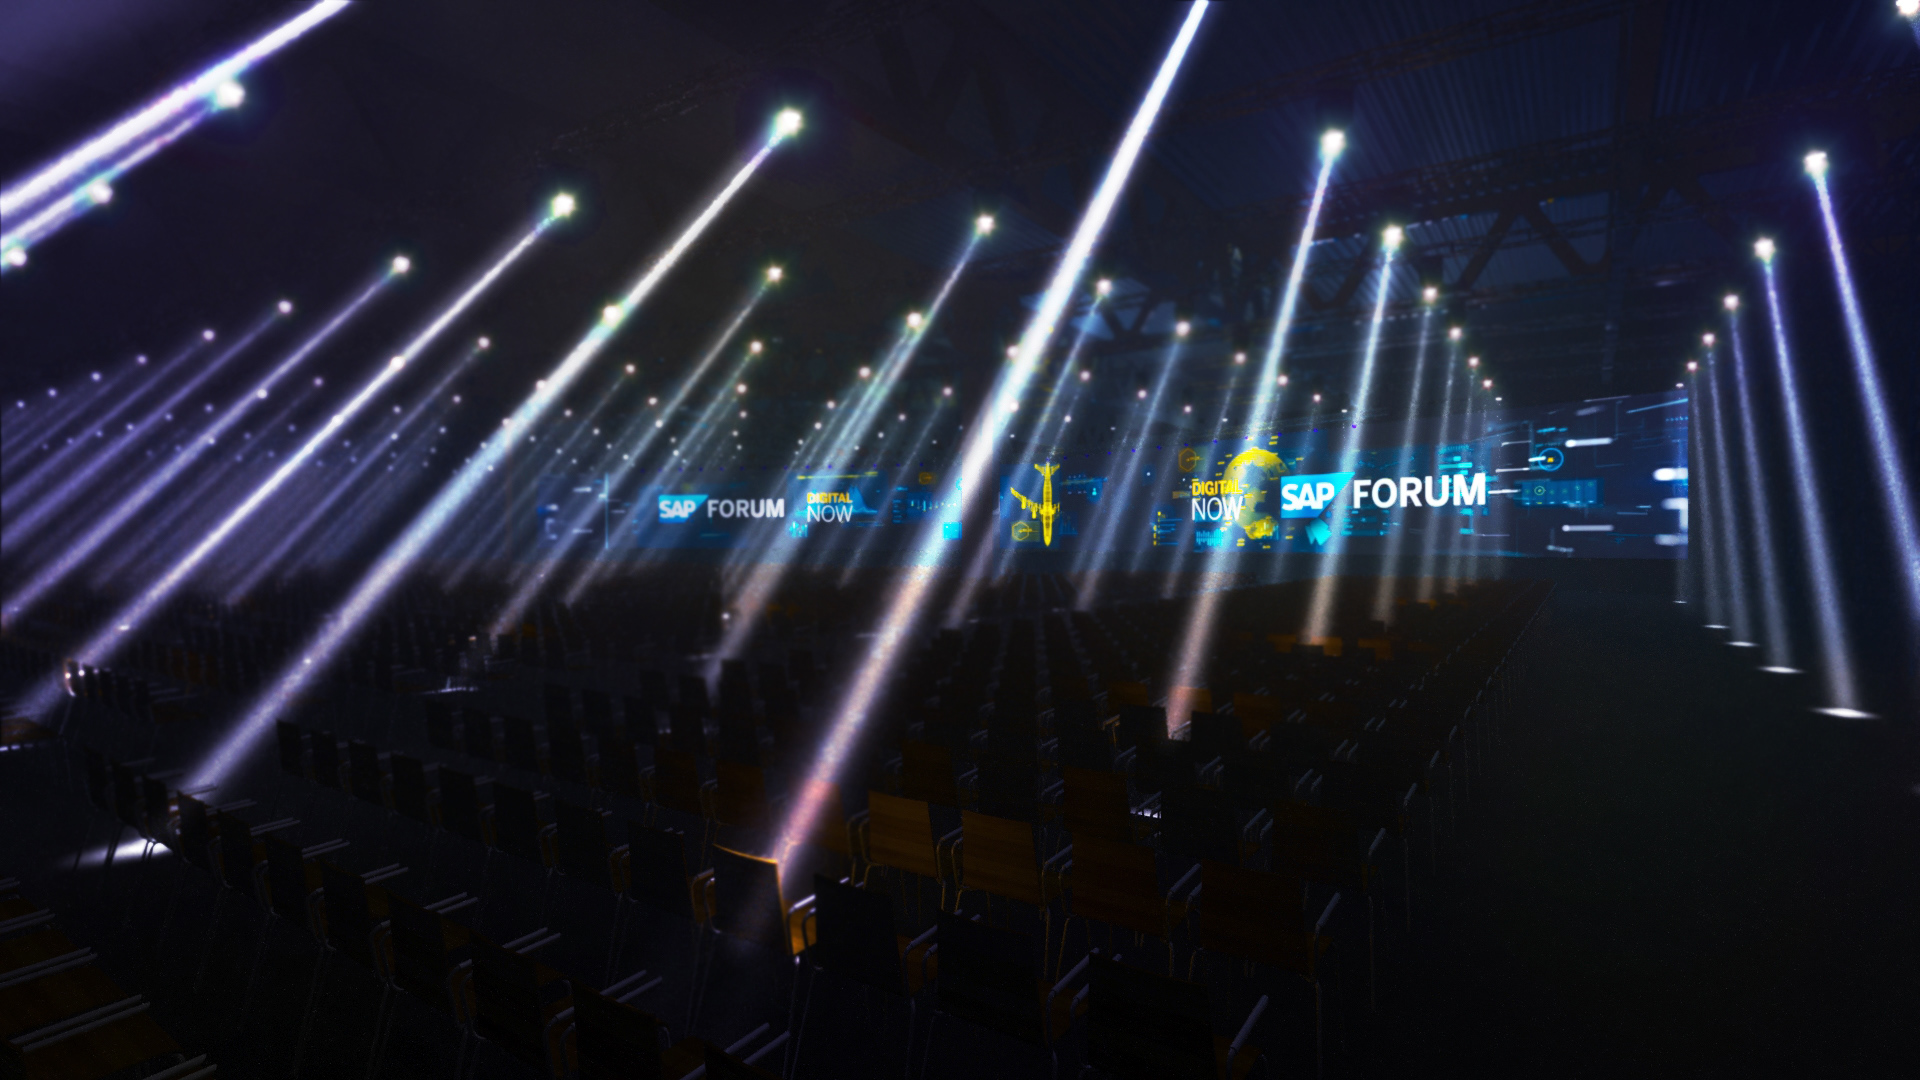 SAP Forum 2017 on Behance